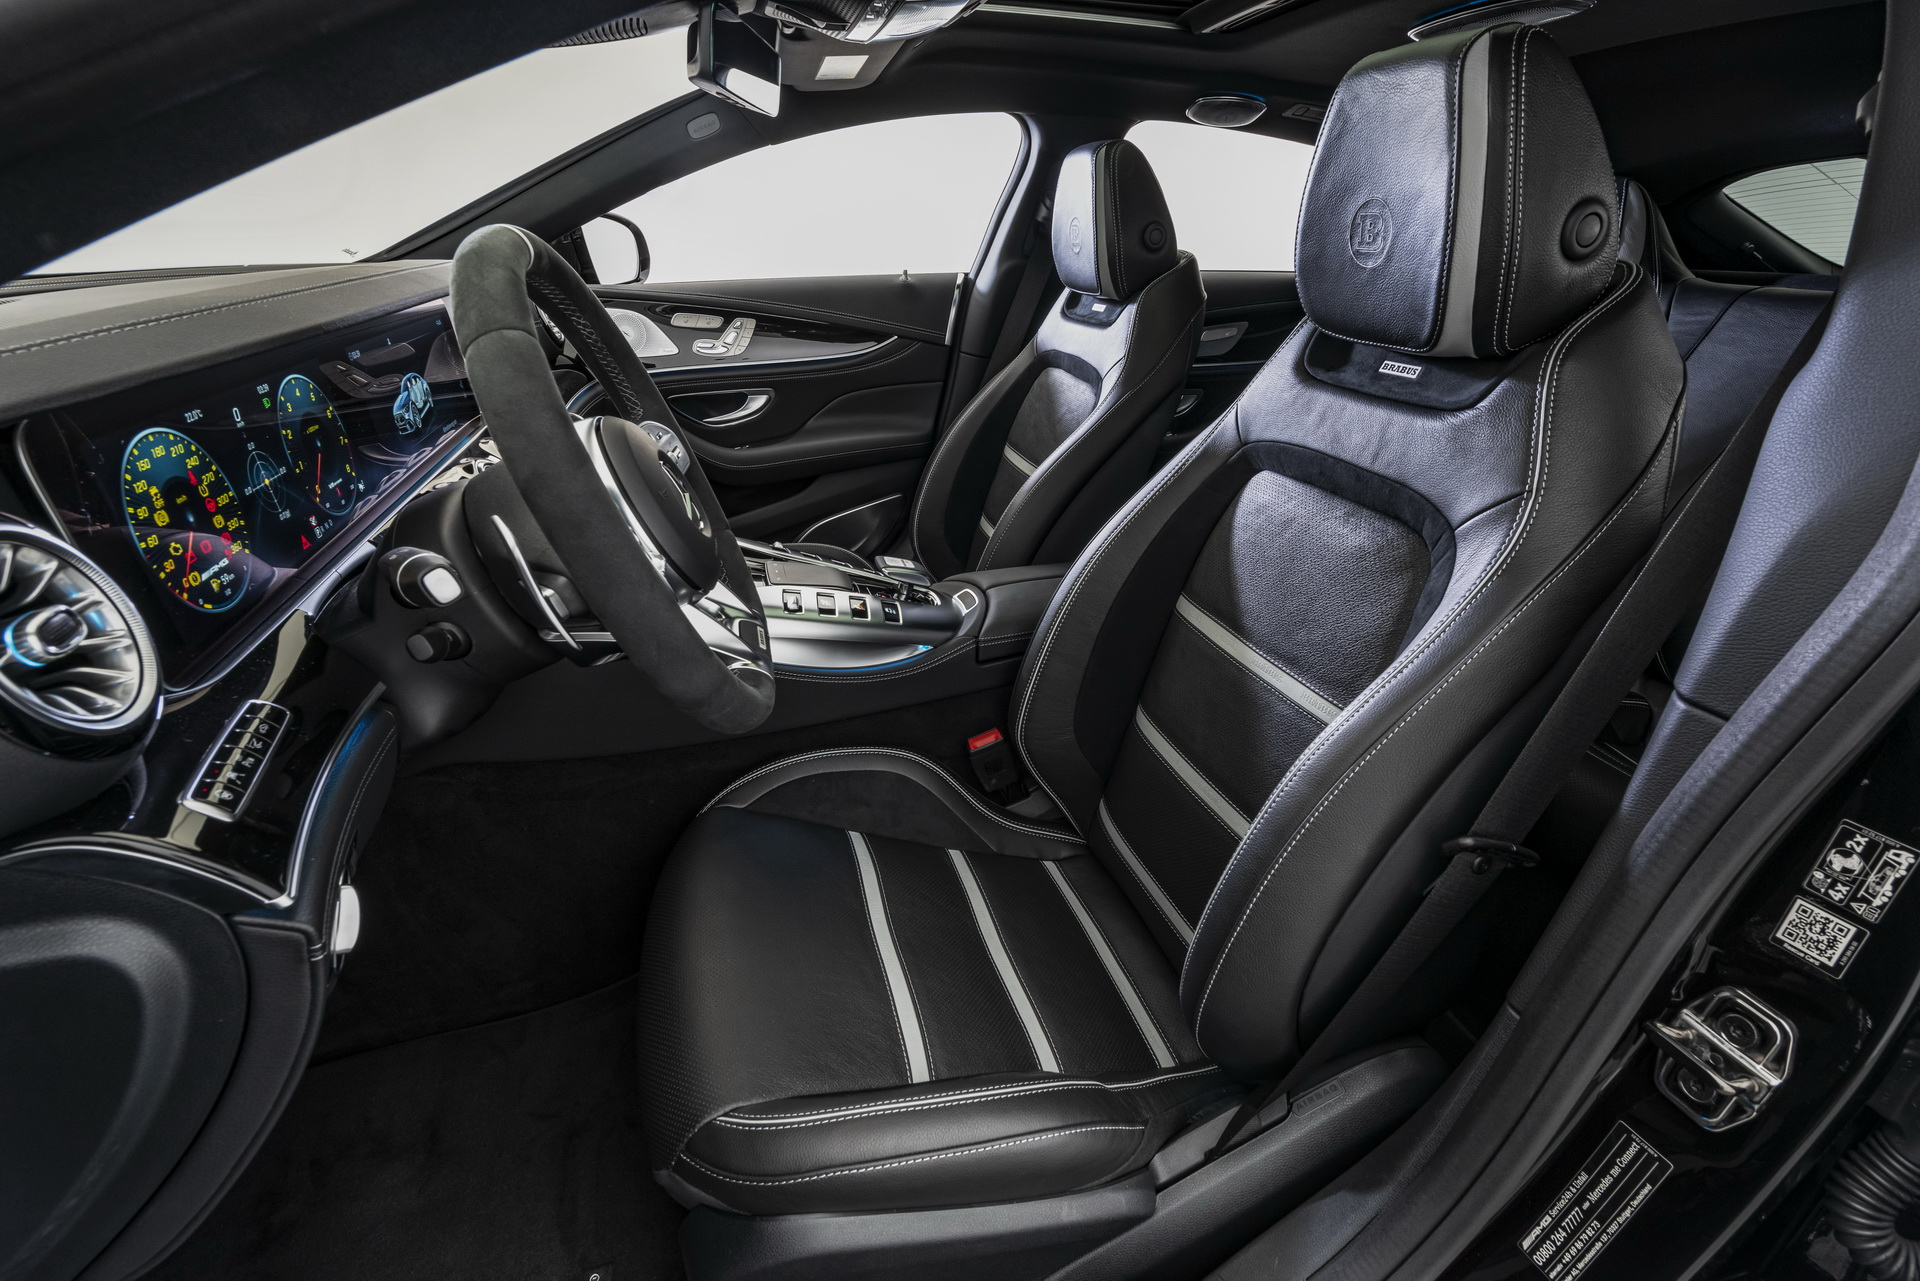 Brabus GT63 S AMG Seats